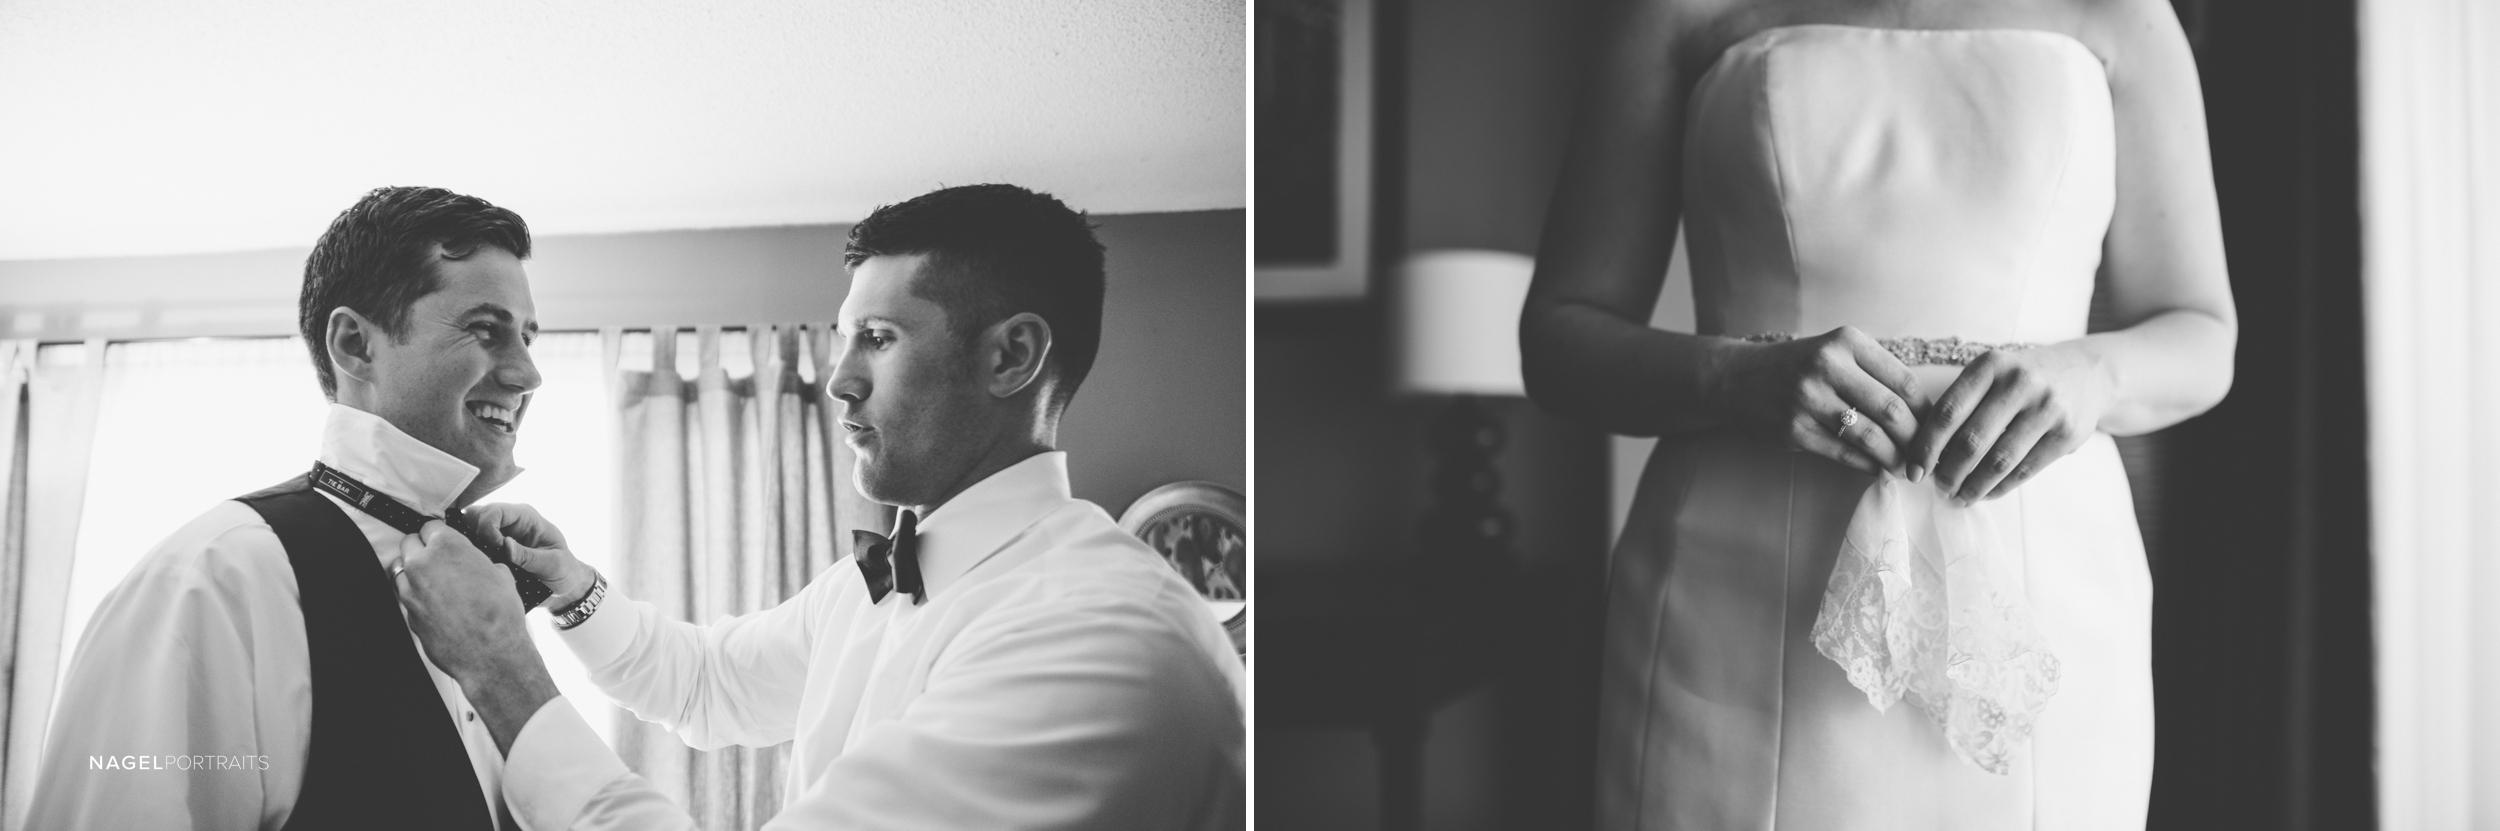 Wedding Blog 4.jpg